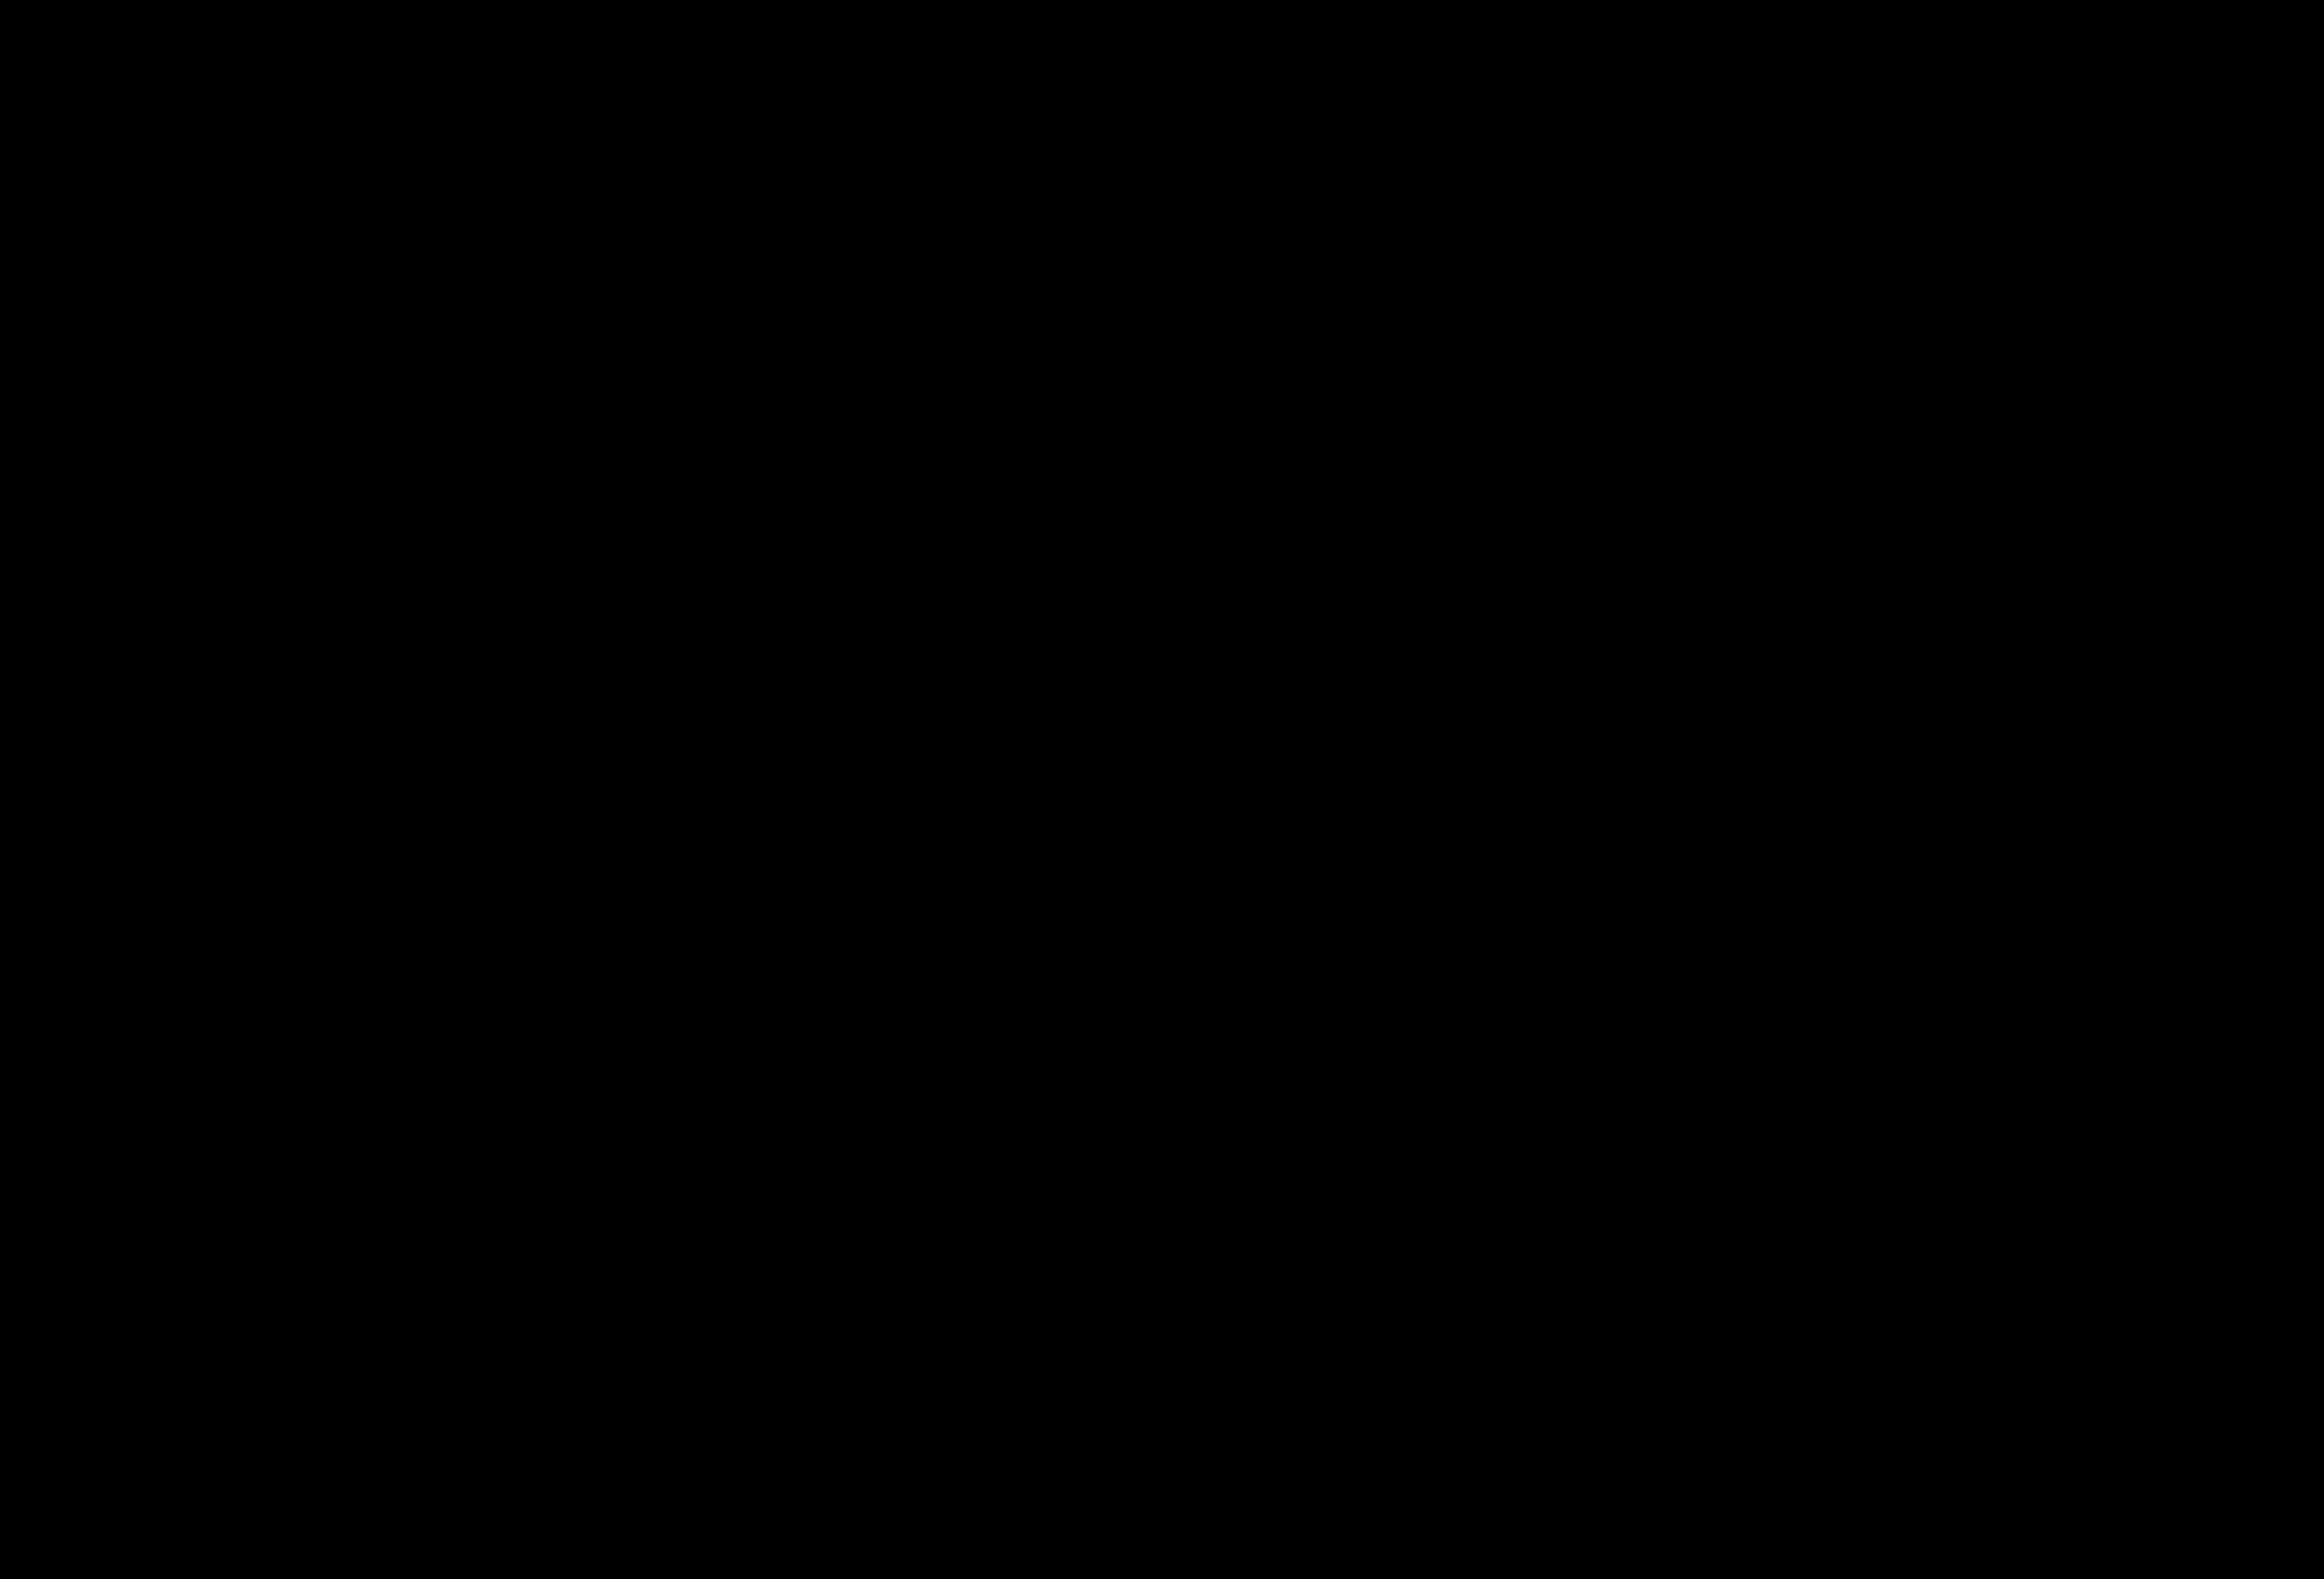 20190226_115207-blanco